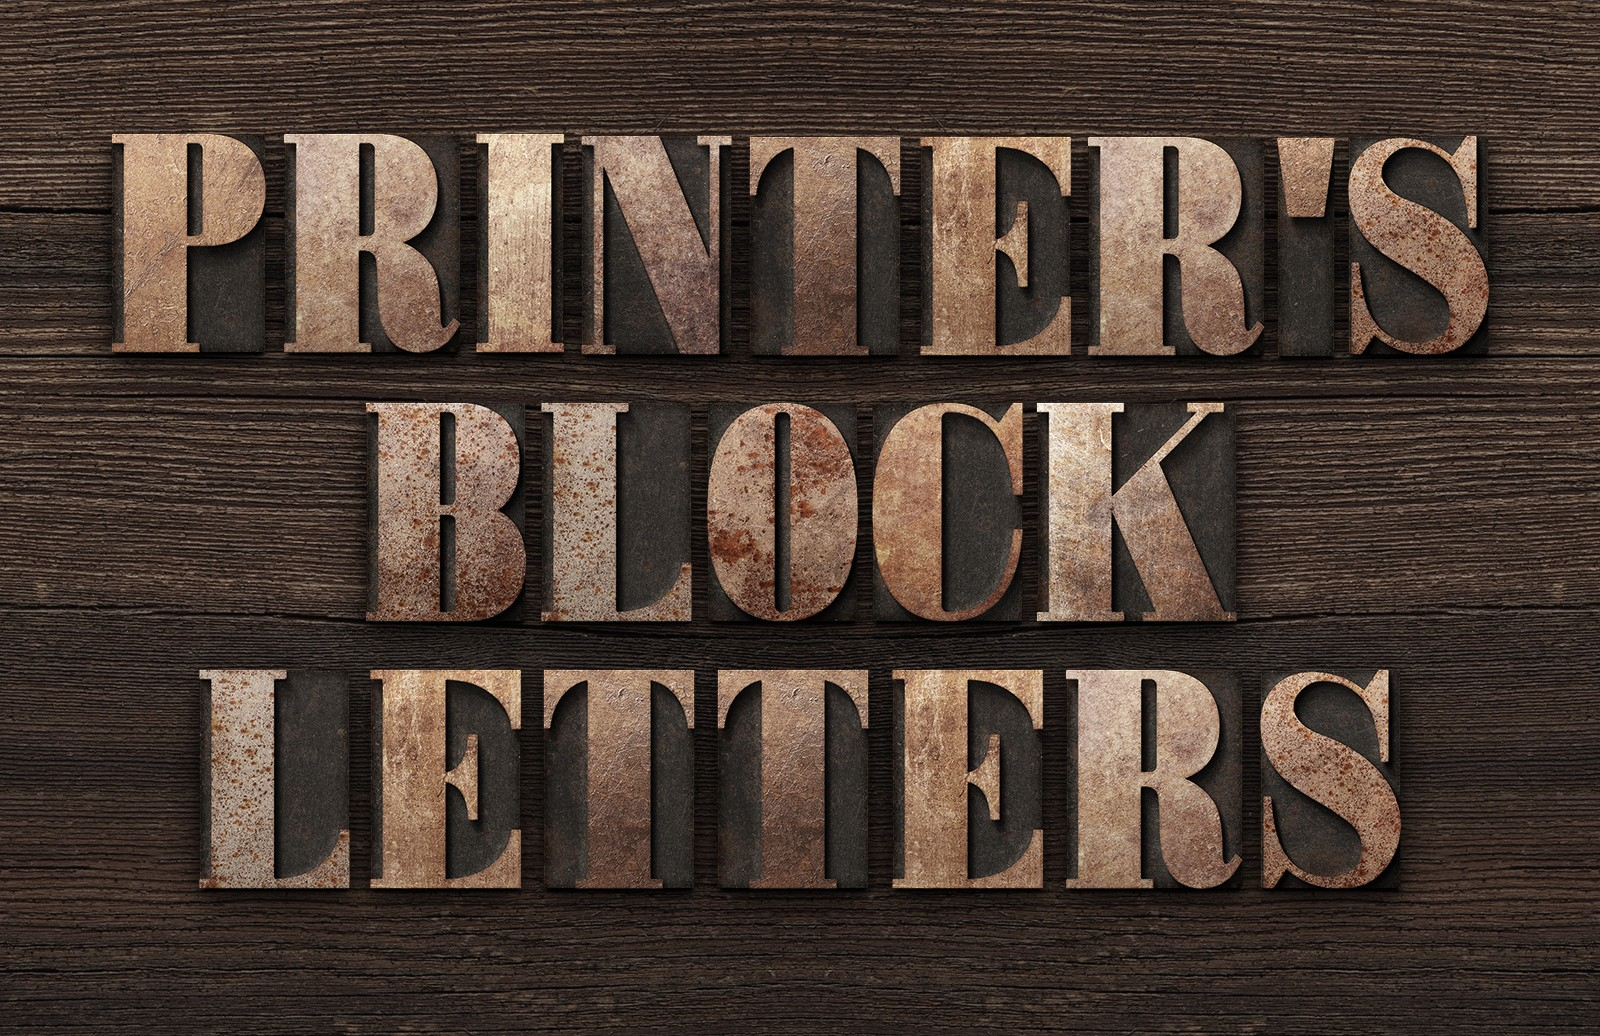 Printer's Letterpress Block Letters 1